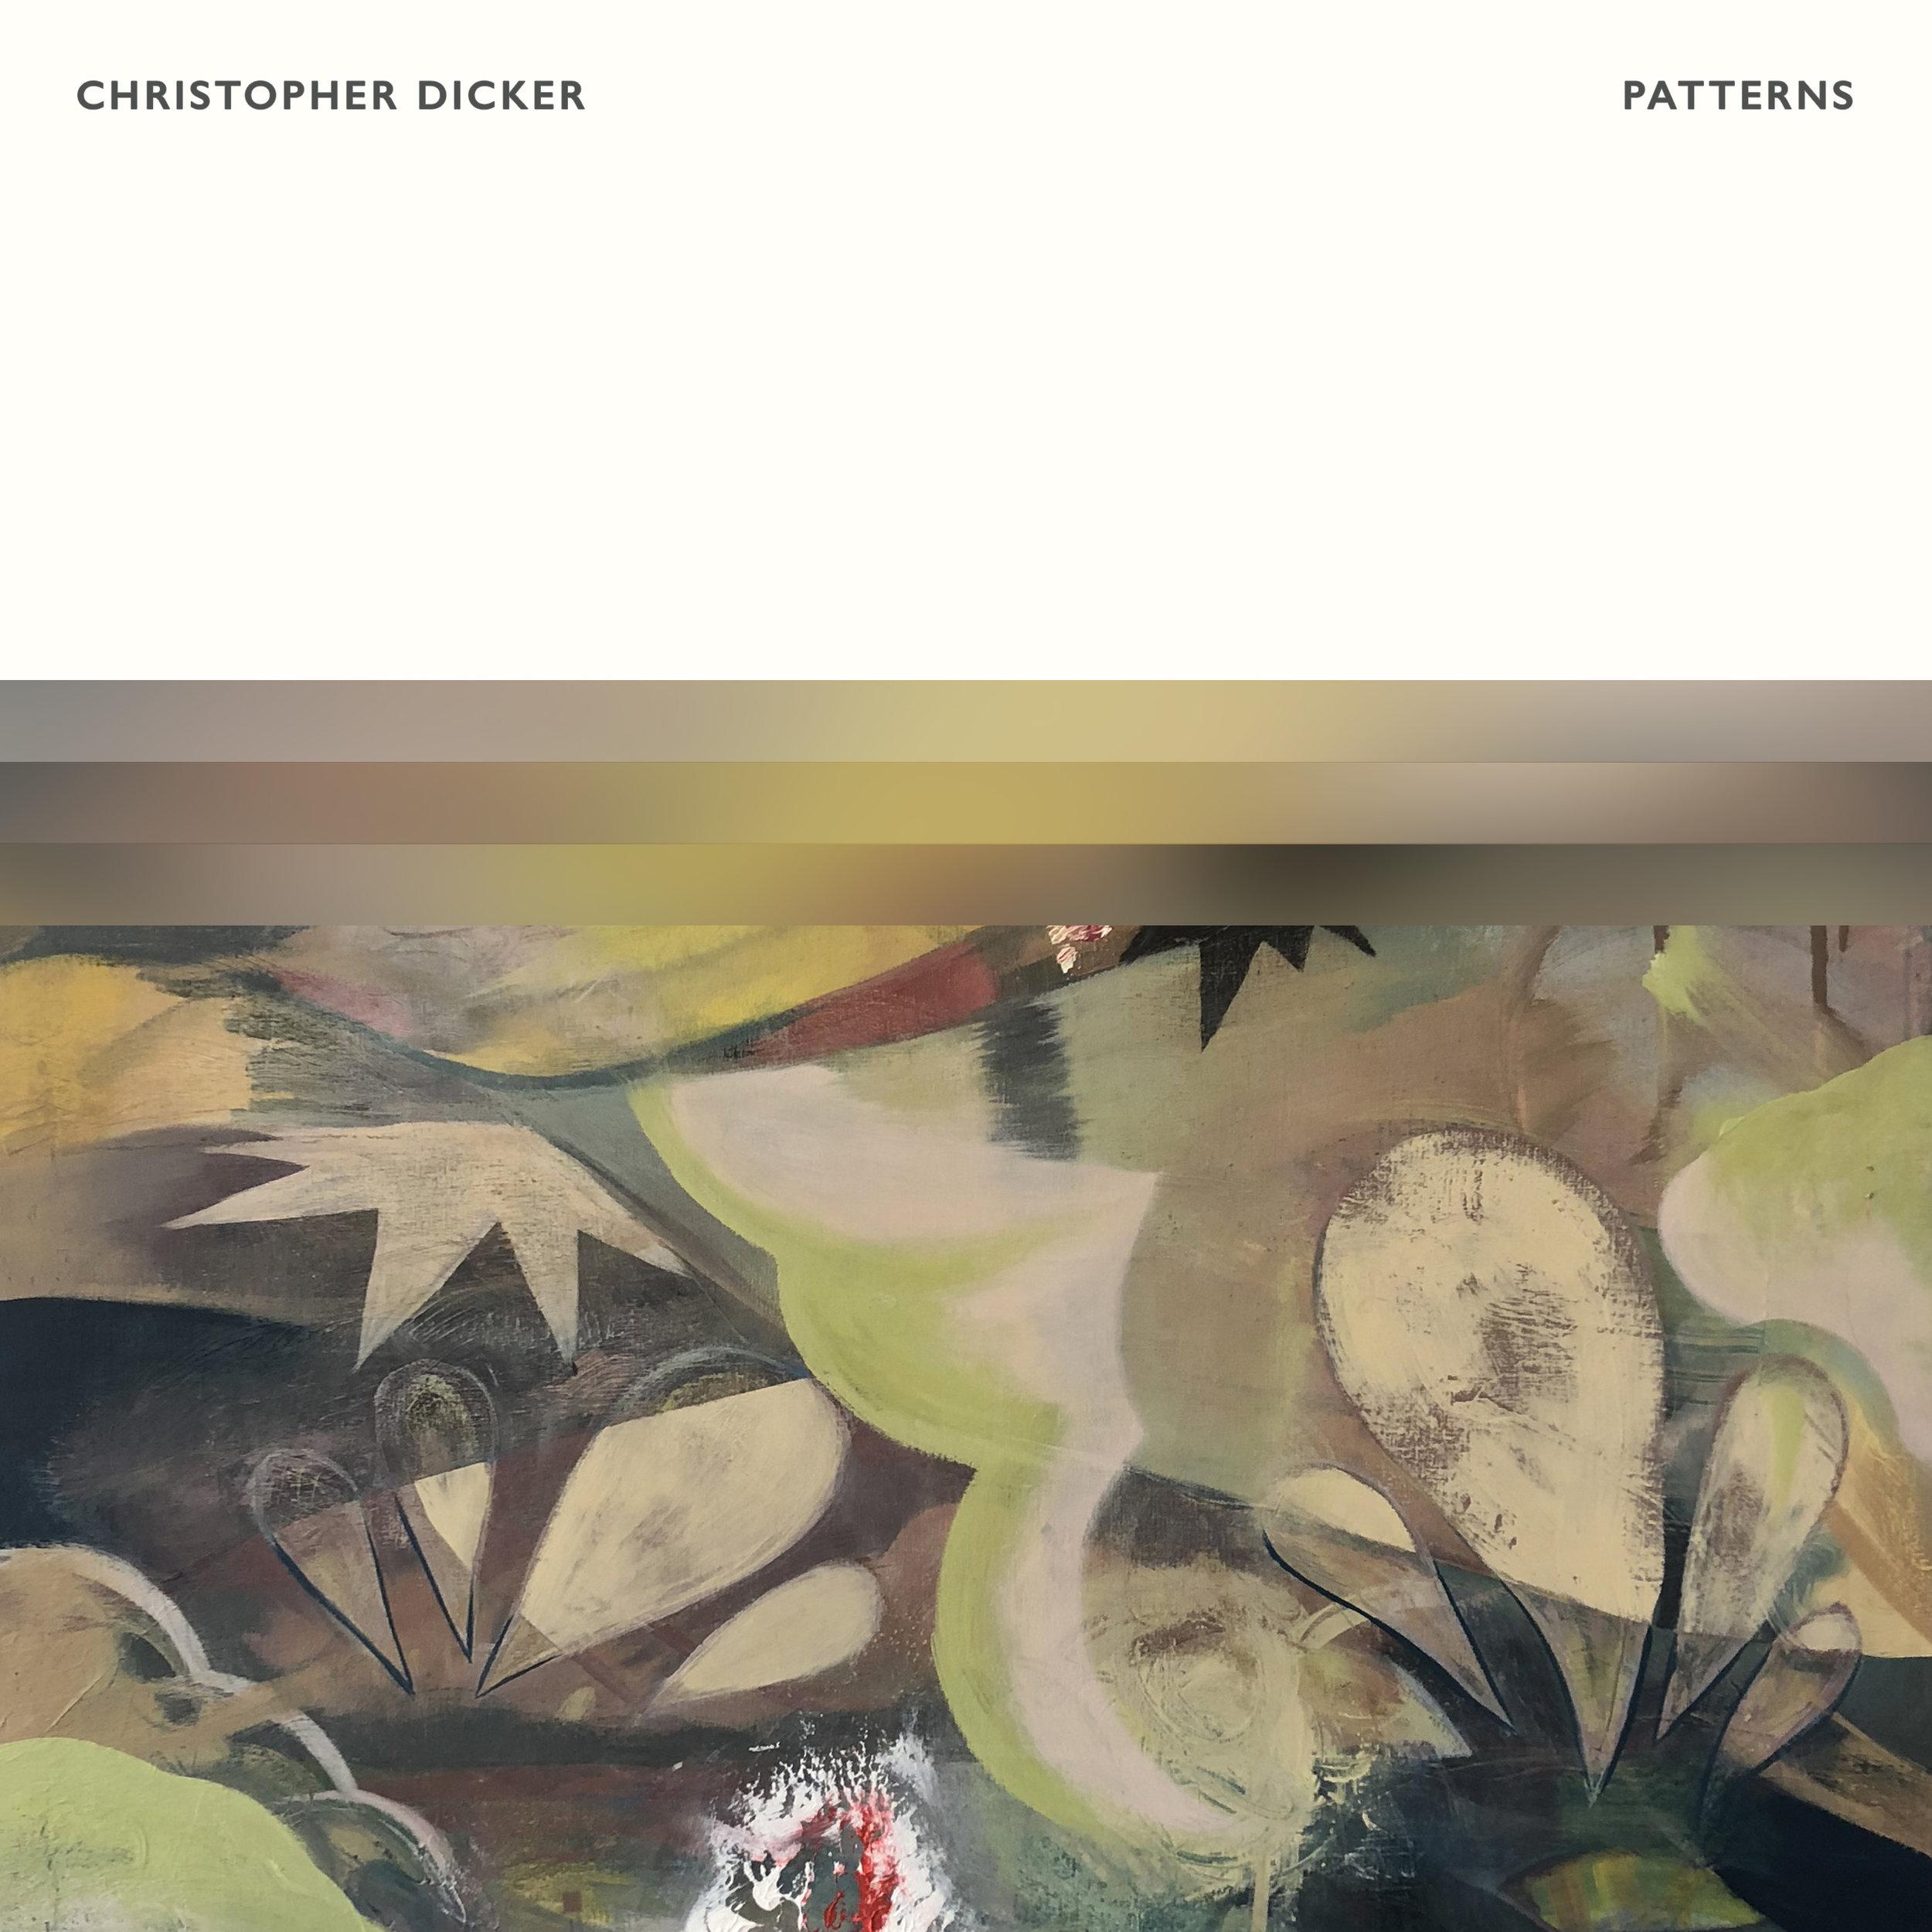 Christopher Dicker - Patterns